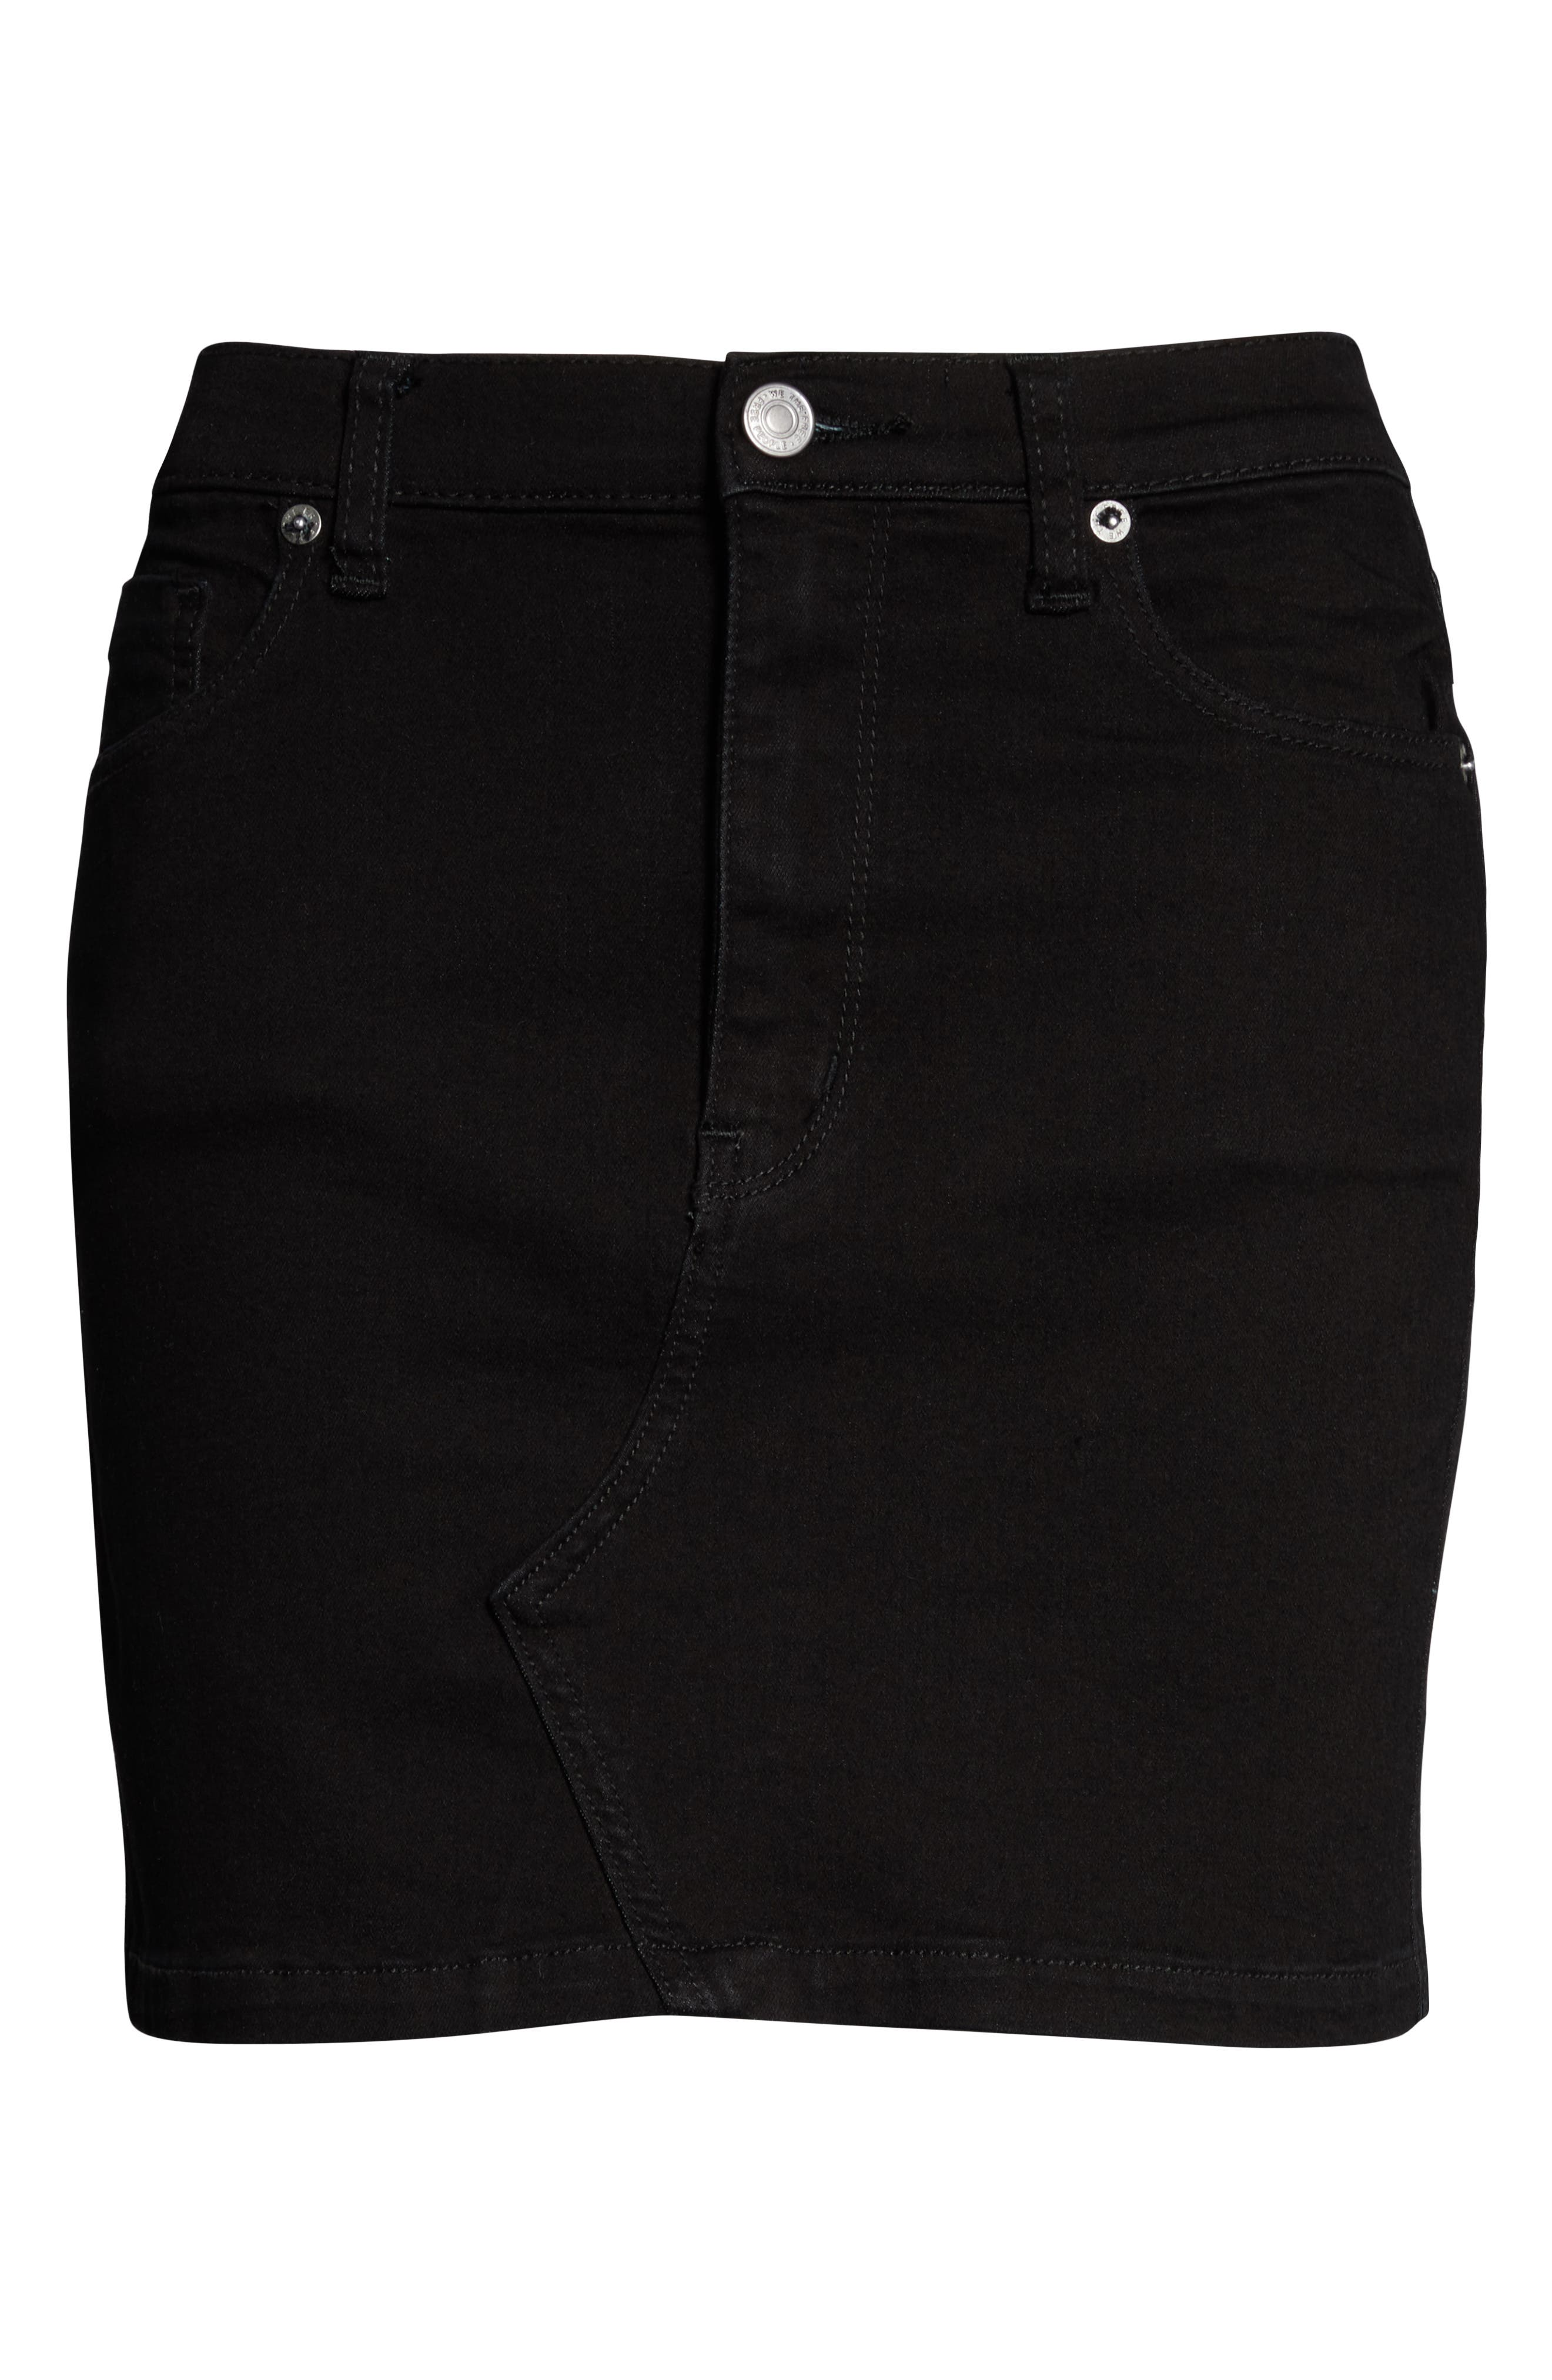 FREE PEOPLE, Teagan Denim Miniskirt, Alternate thumbnail 6, color, BLACK